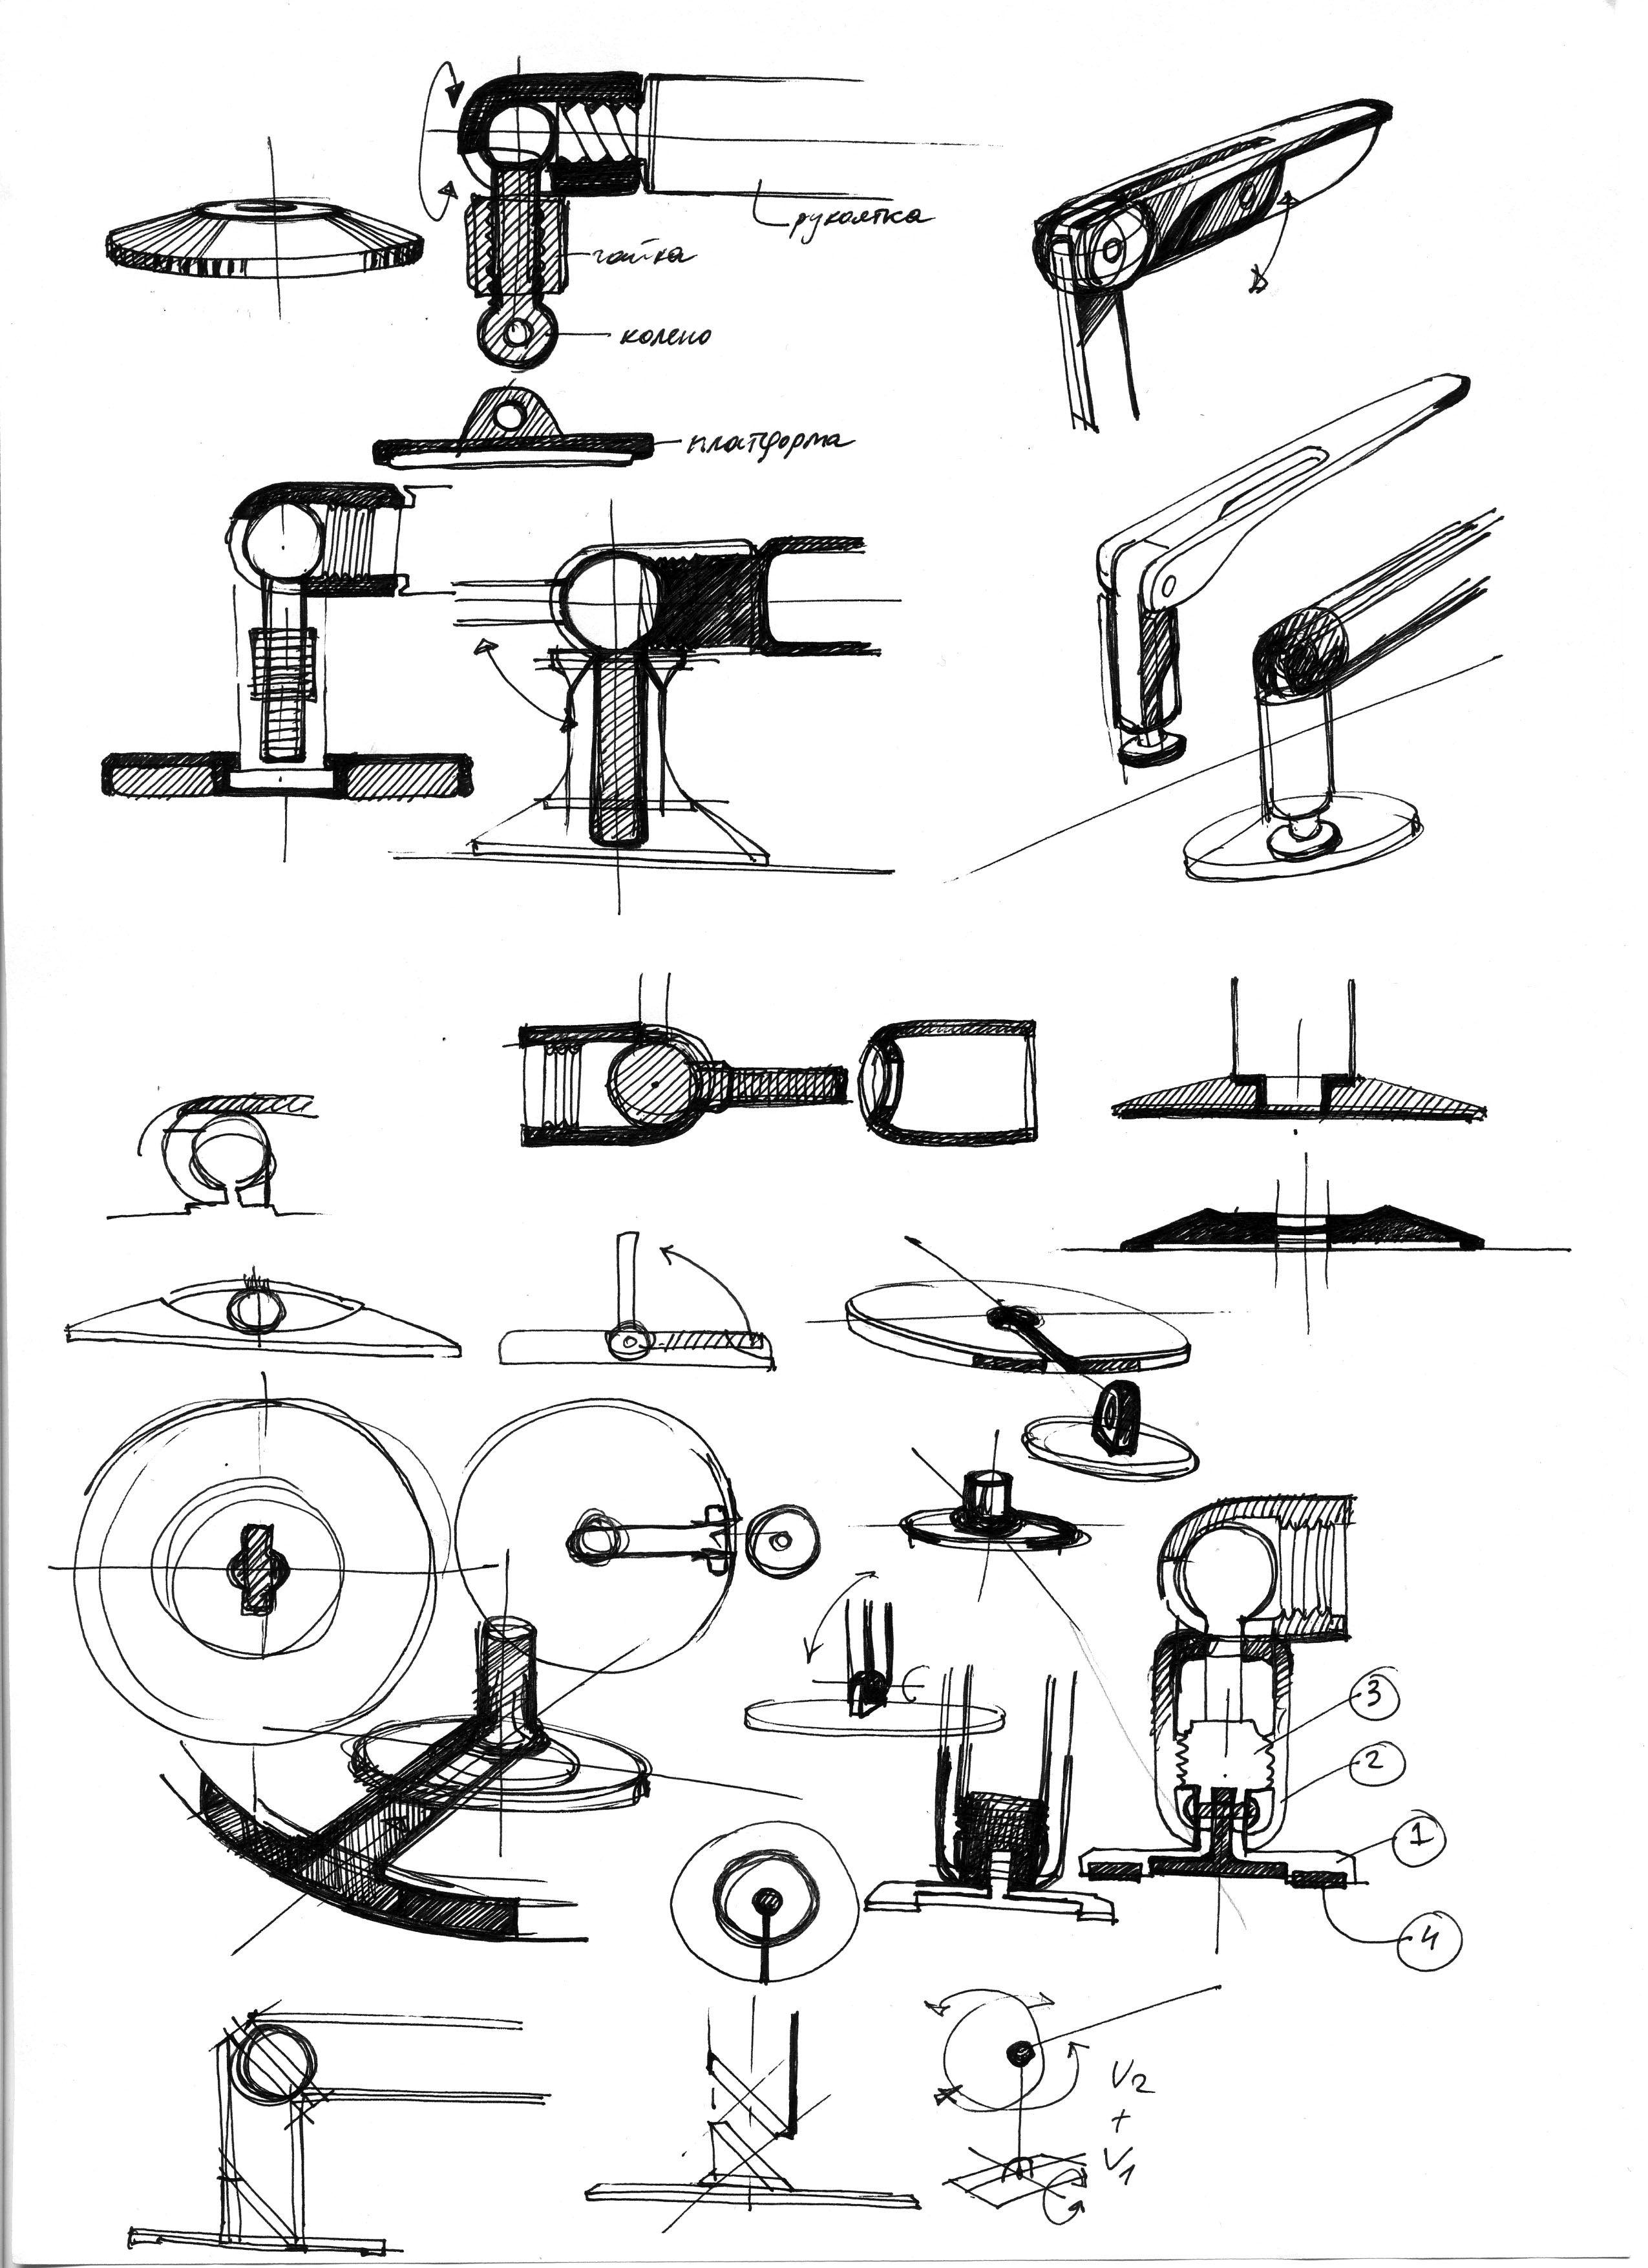 #iOS, #Android, #Windows, #Design, #iPhone, #iPad, #Rams